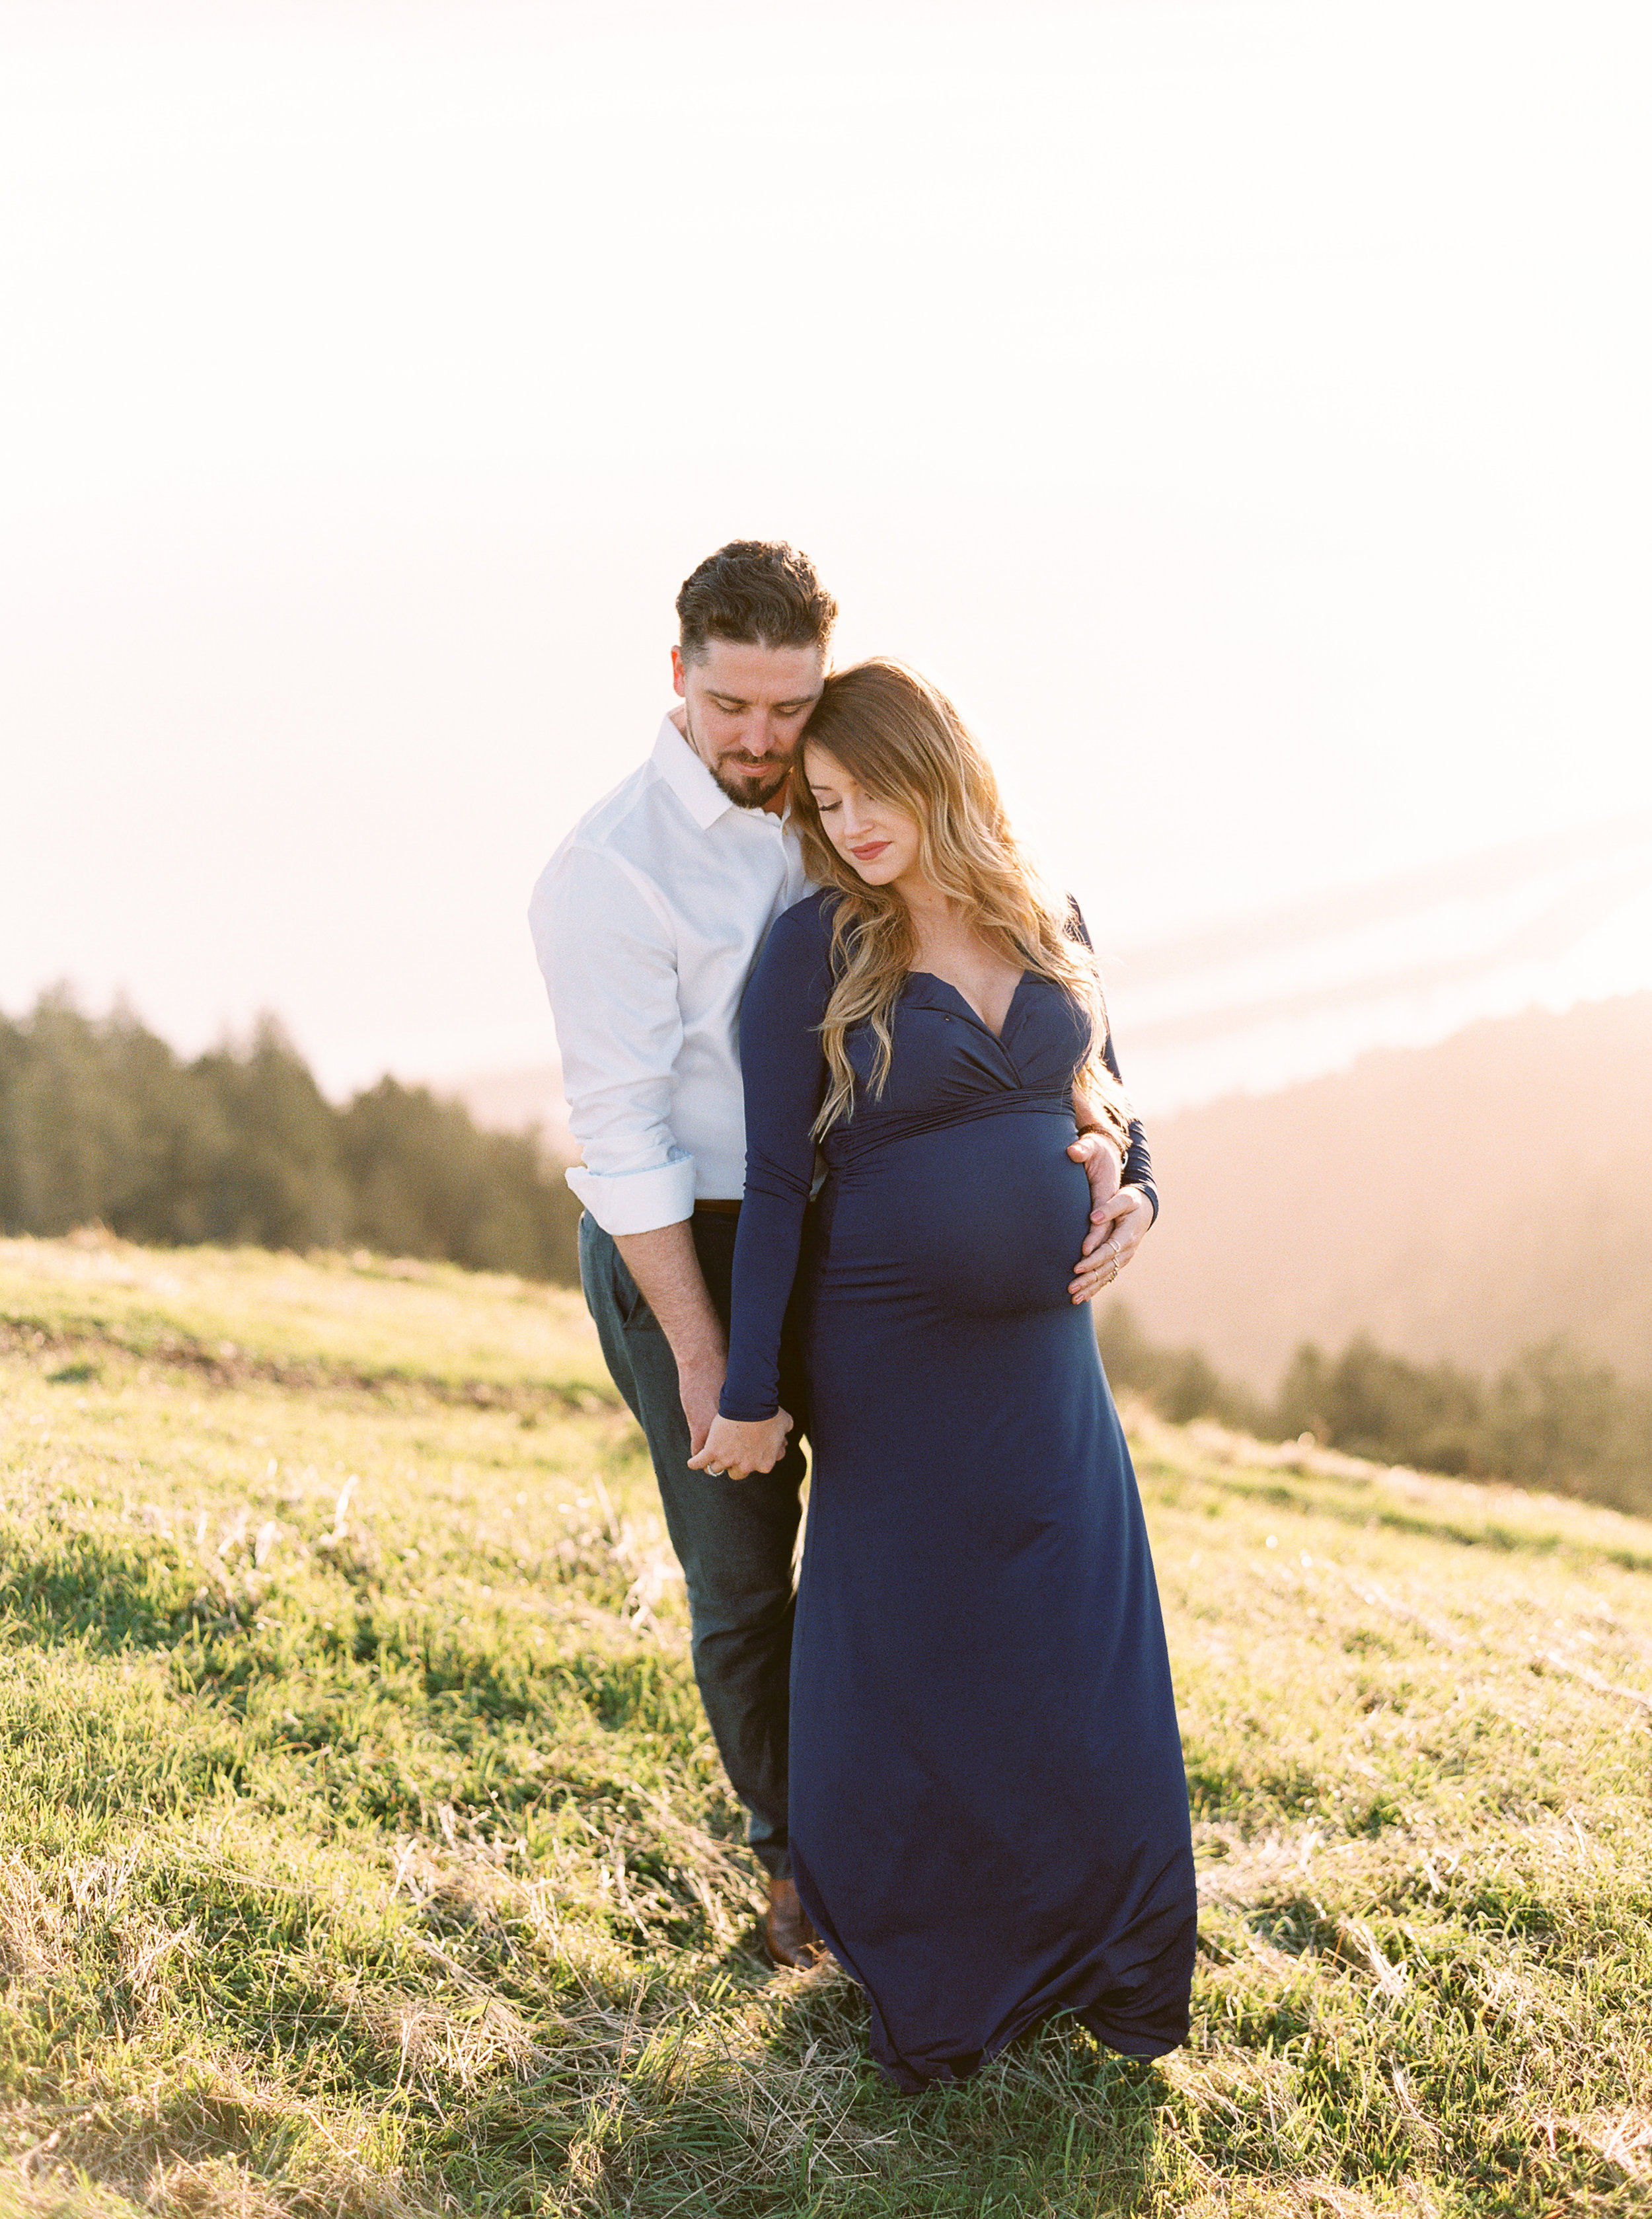 mount-tamalpais-san-francisco-maternity-photography-64.jpg